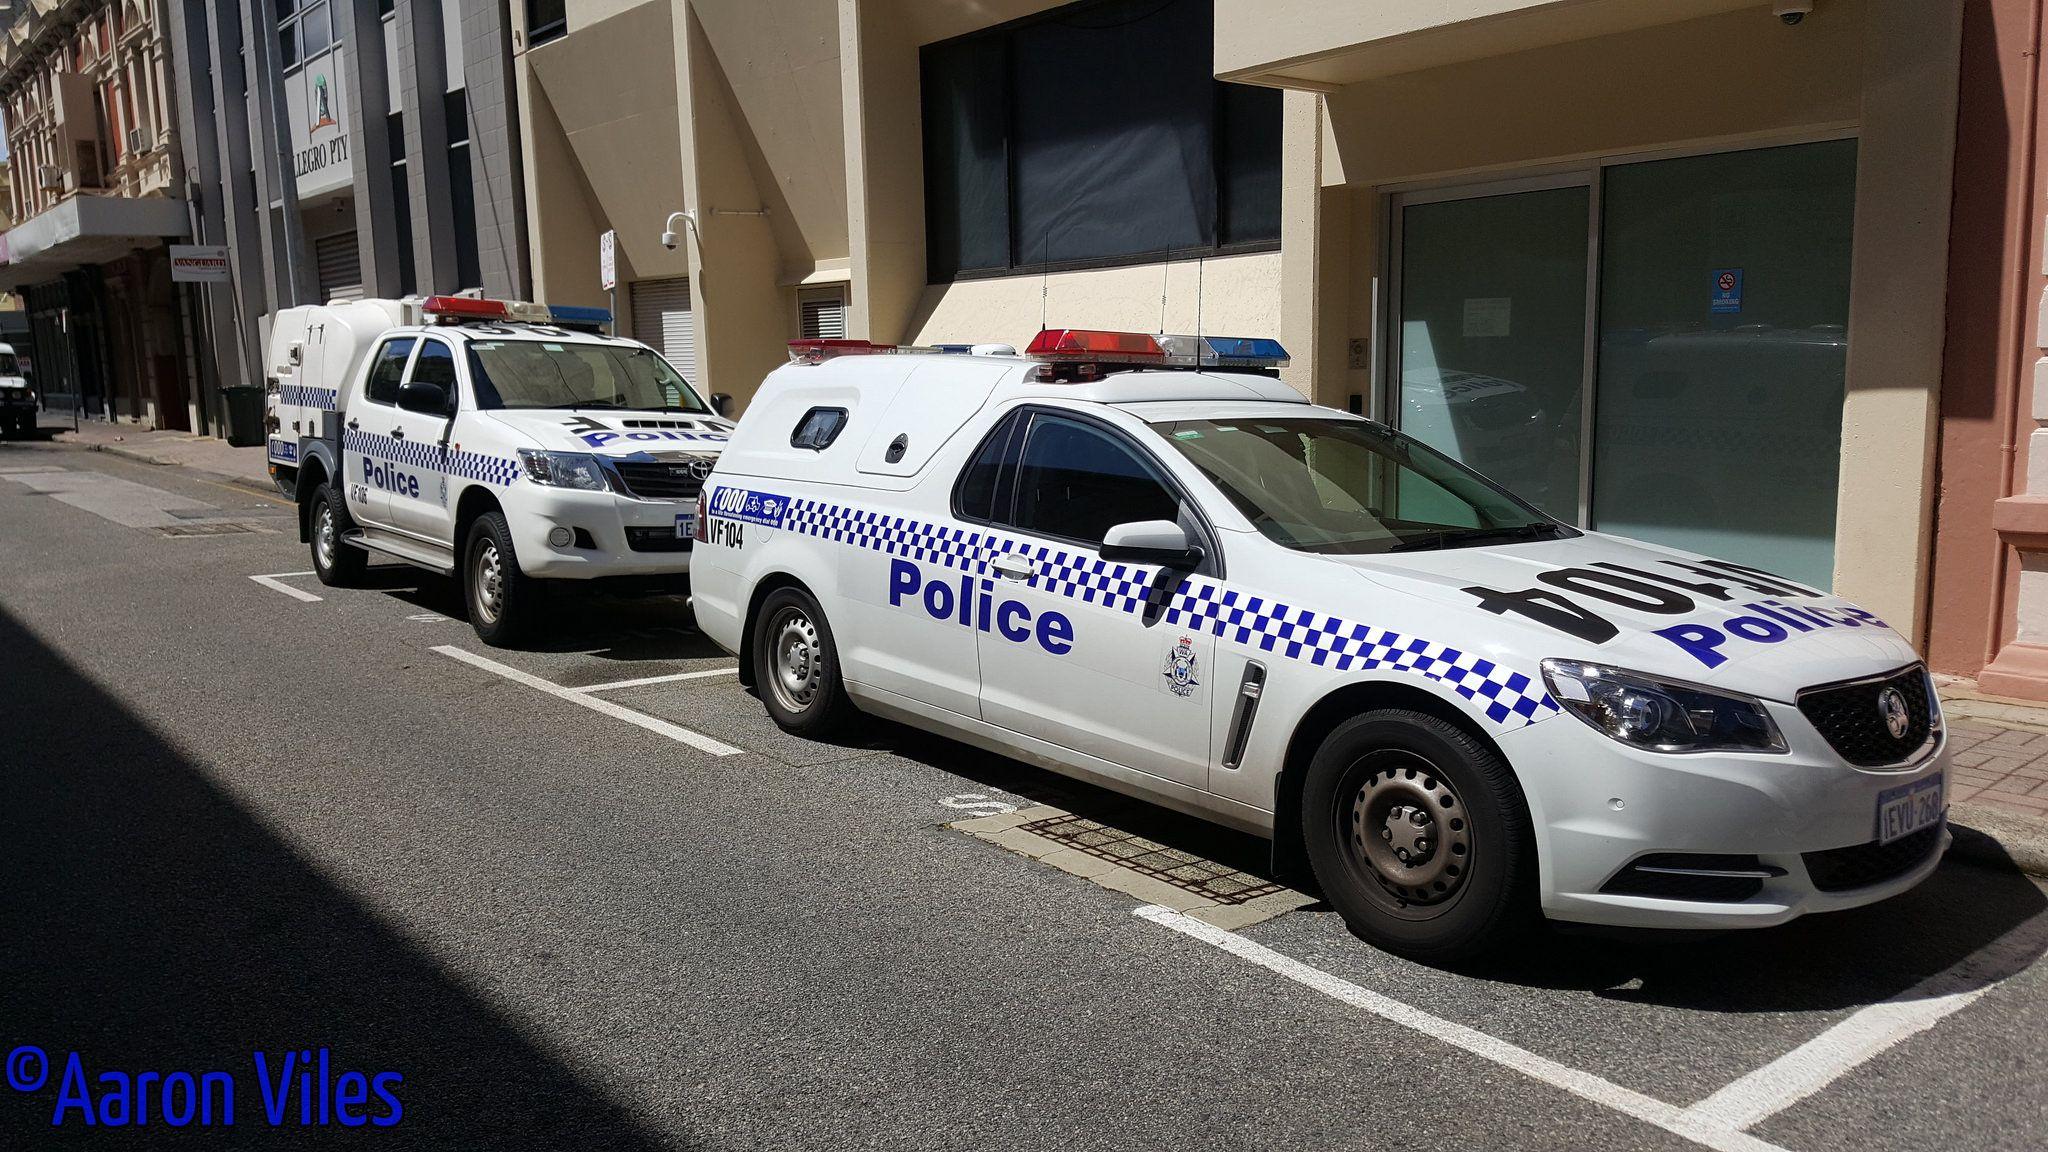 Western Australia Police Western Australia Police Pinterest